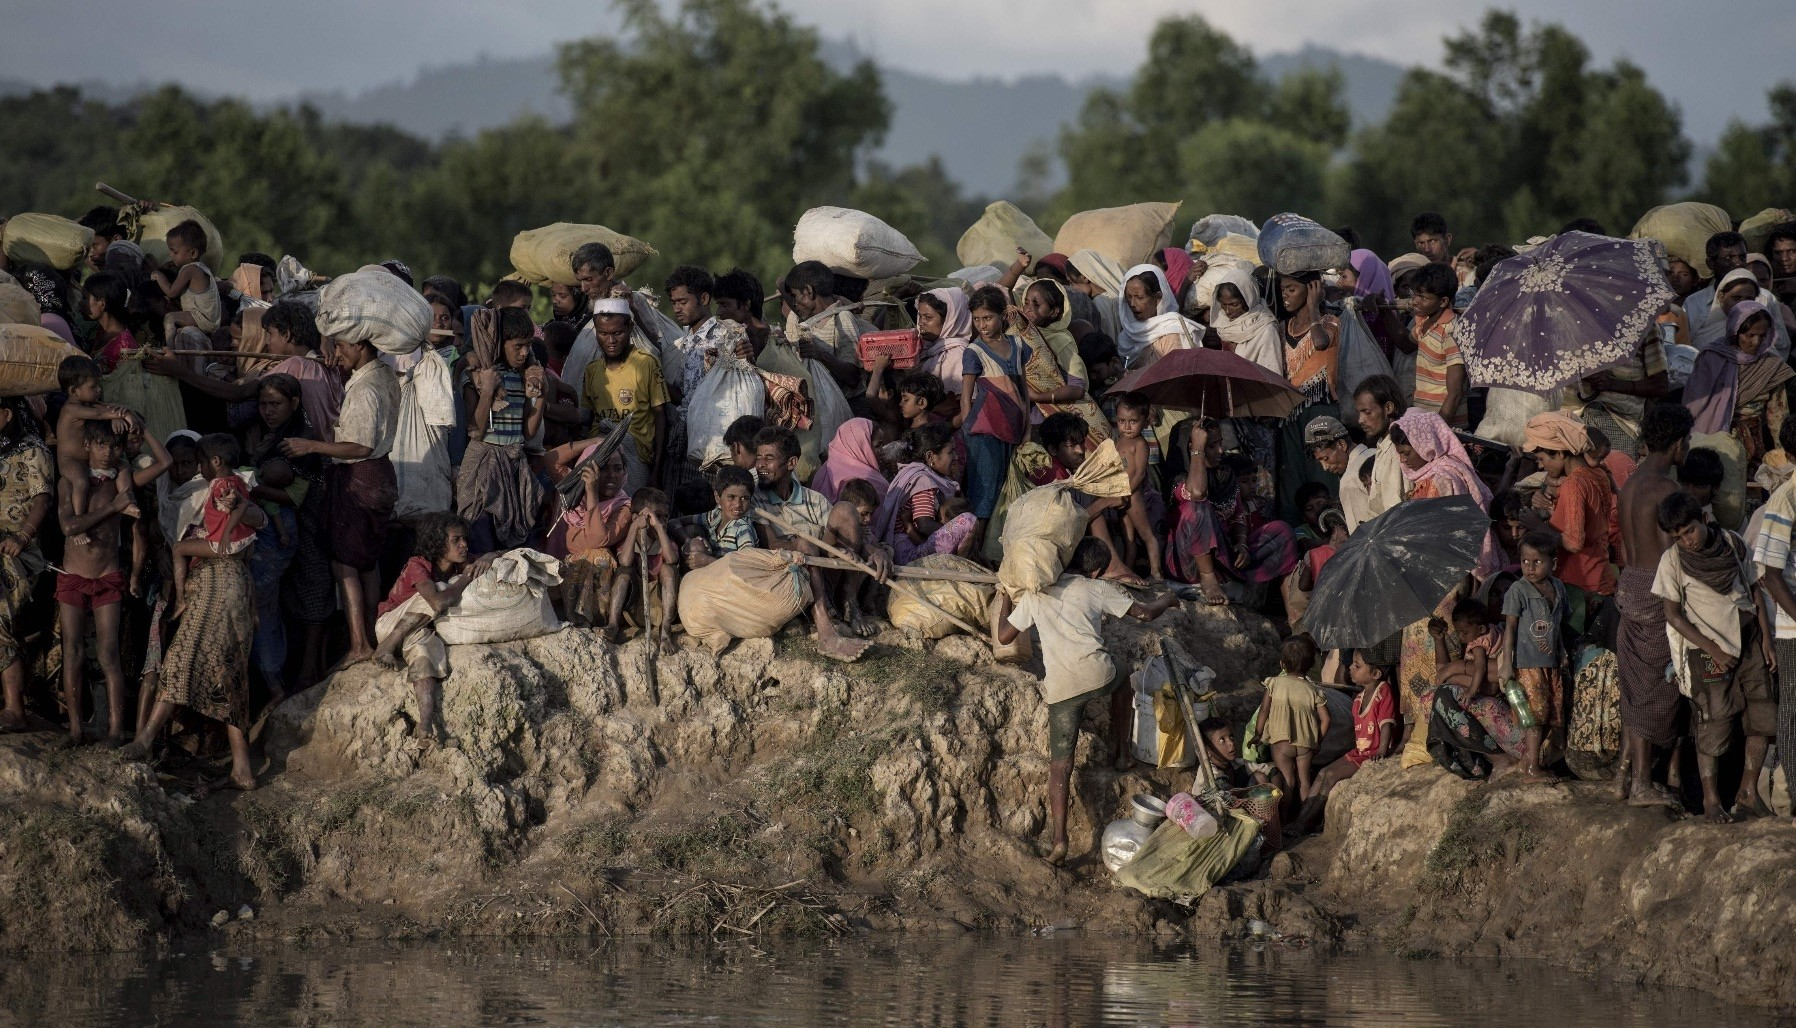 Rohingya refugees fleeing Myanmar arrive at the Naf river, Whaikyang, Bangladesh, Oct. 10, 2017.